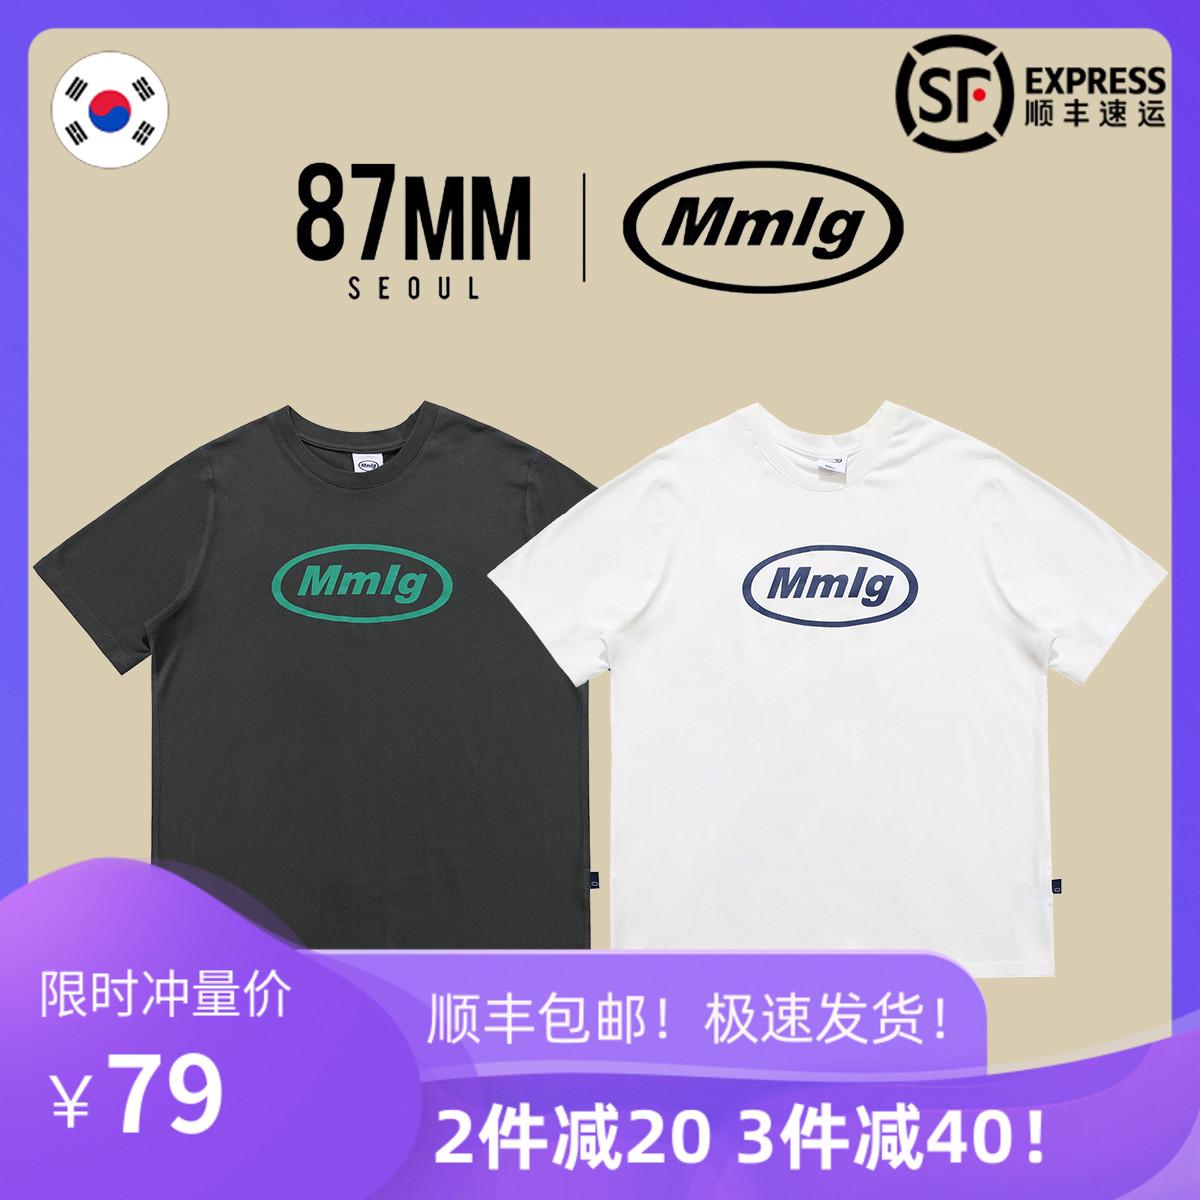 87mm韩国潮牌mmlg新款ins宽松女字母纯棉情侣1987圆领白色短袖T恤